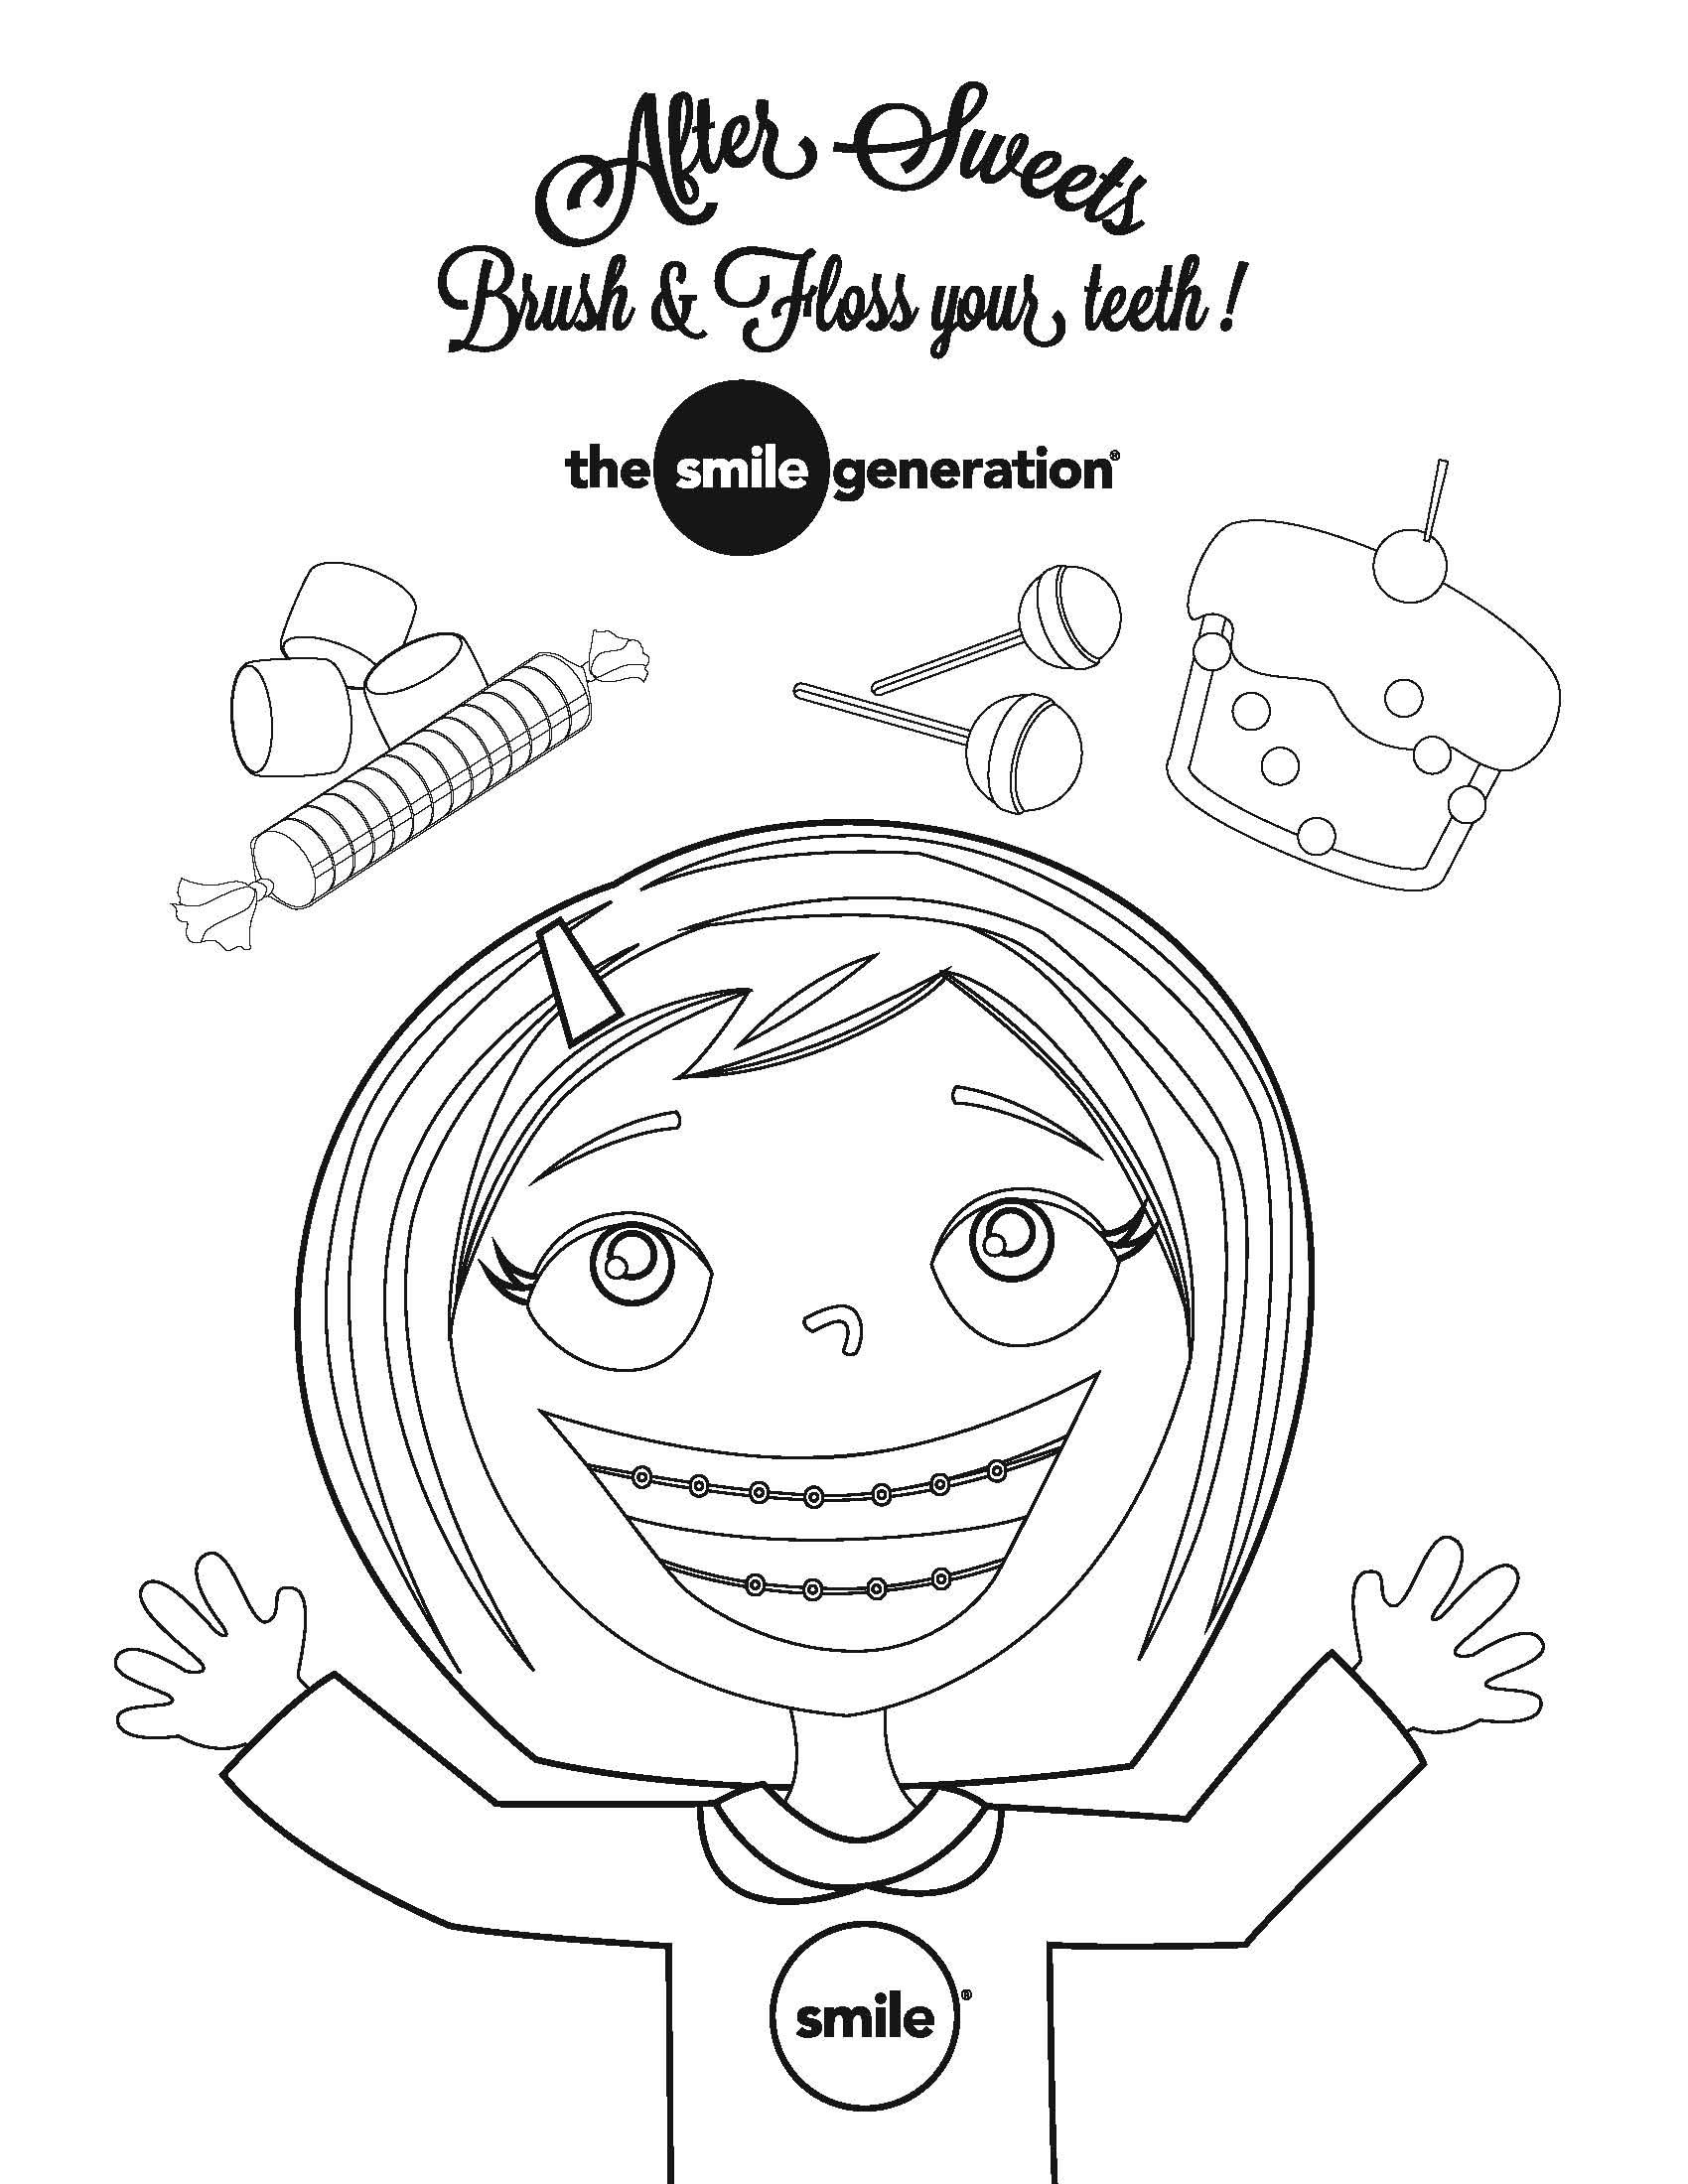 Rock Your Smile: It's National Children's Dental Health